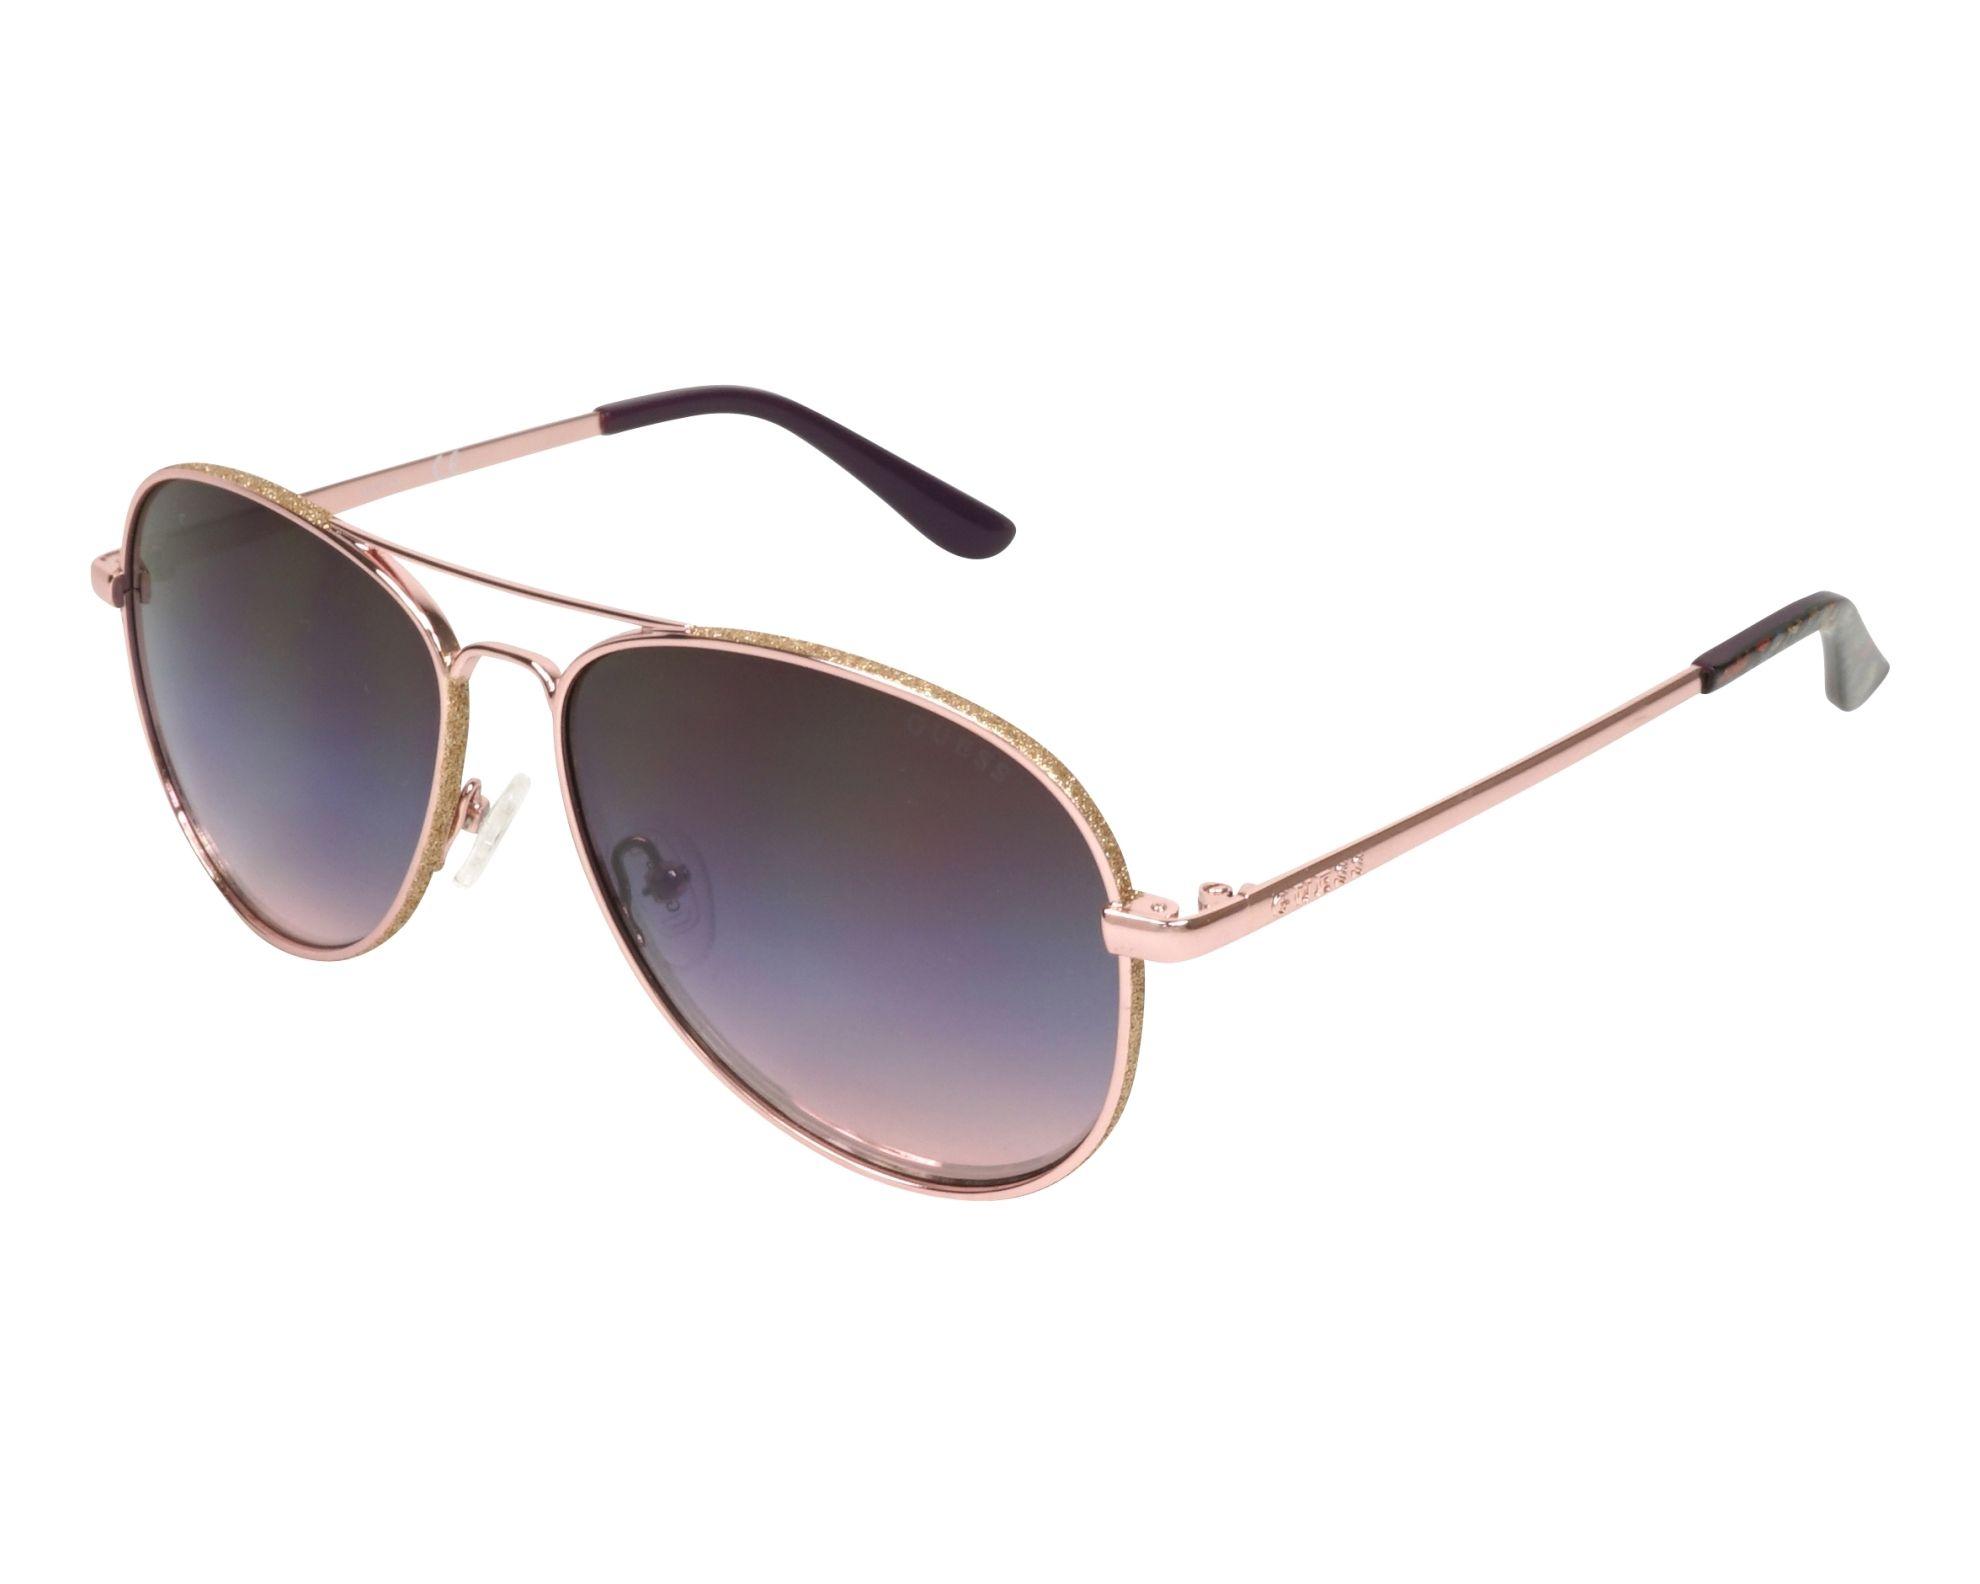 032e1387140 Sunglasses Guess GU-7555-S 28U 59-14 Gold Copper Gold profile view